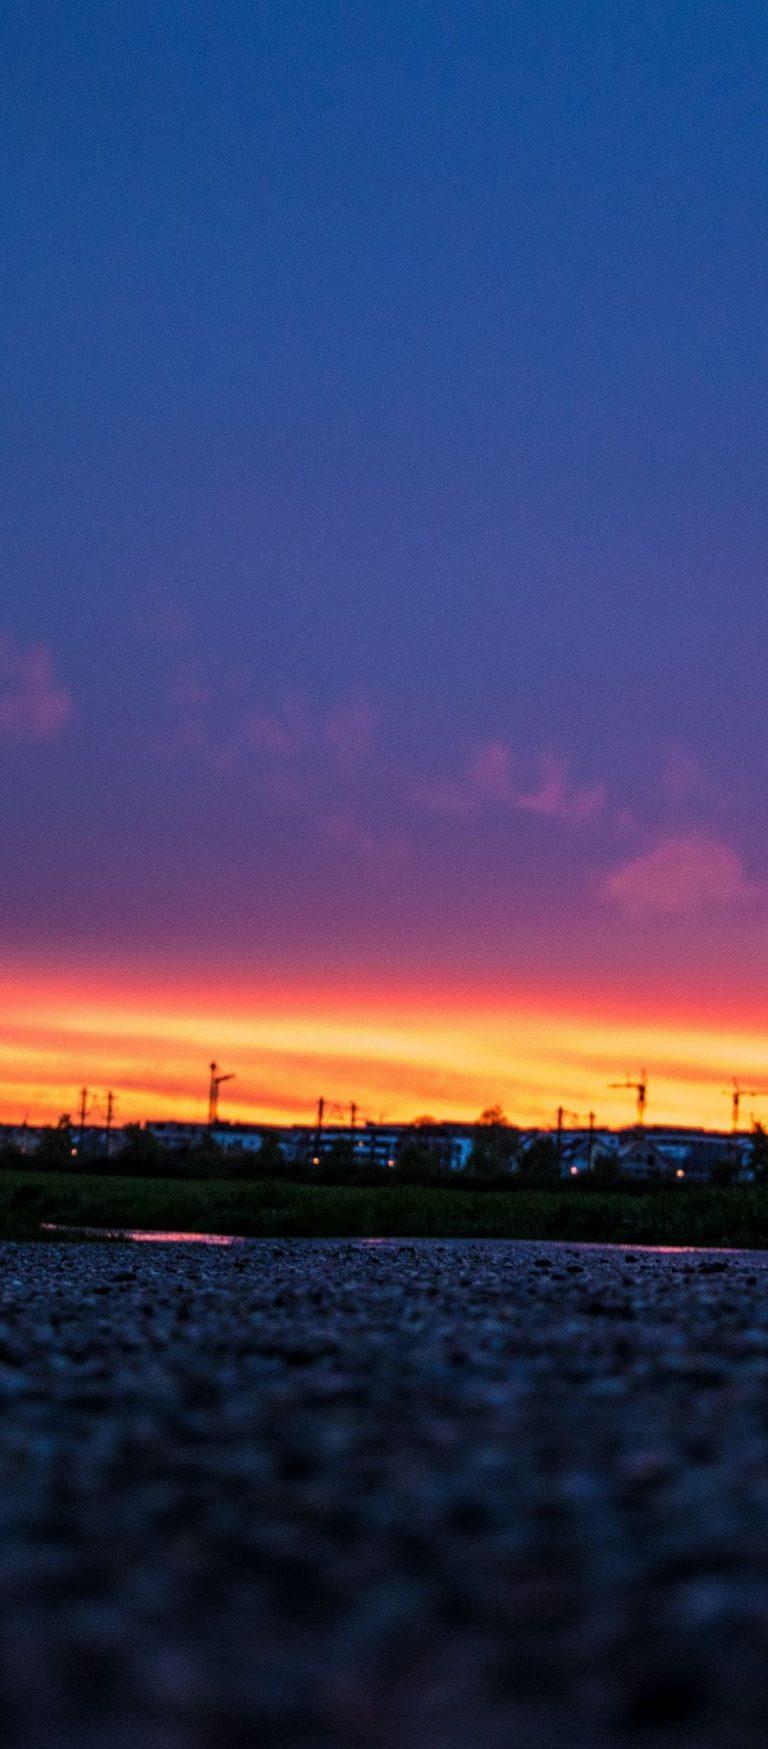 Night Sky Sunset Road 1080x2460 768x1749